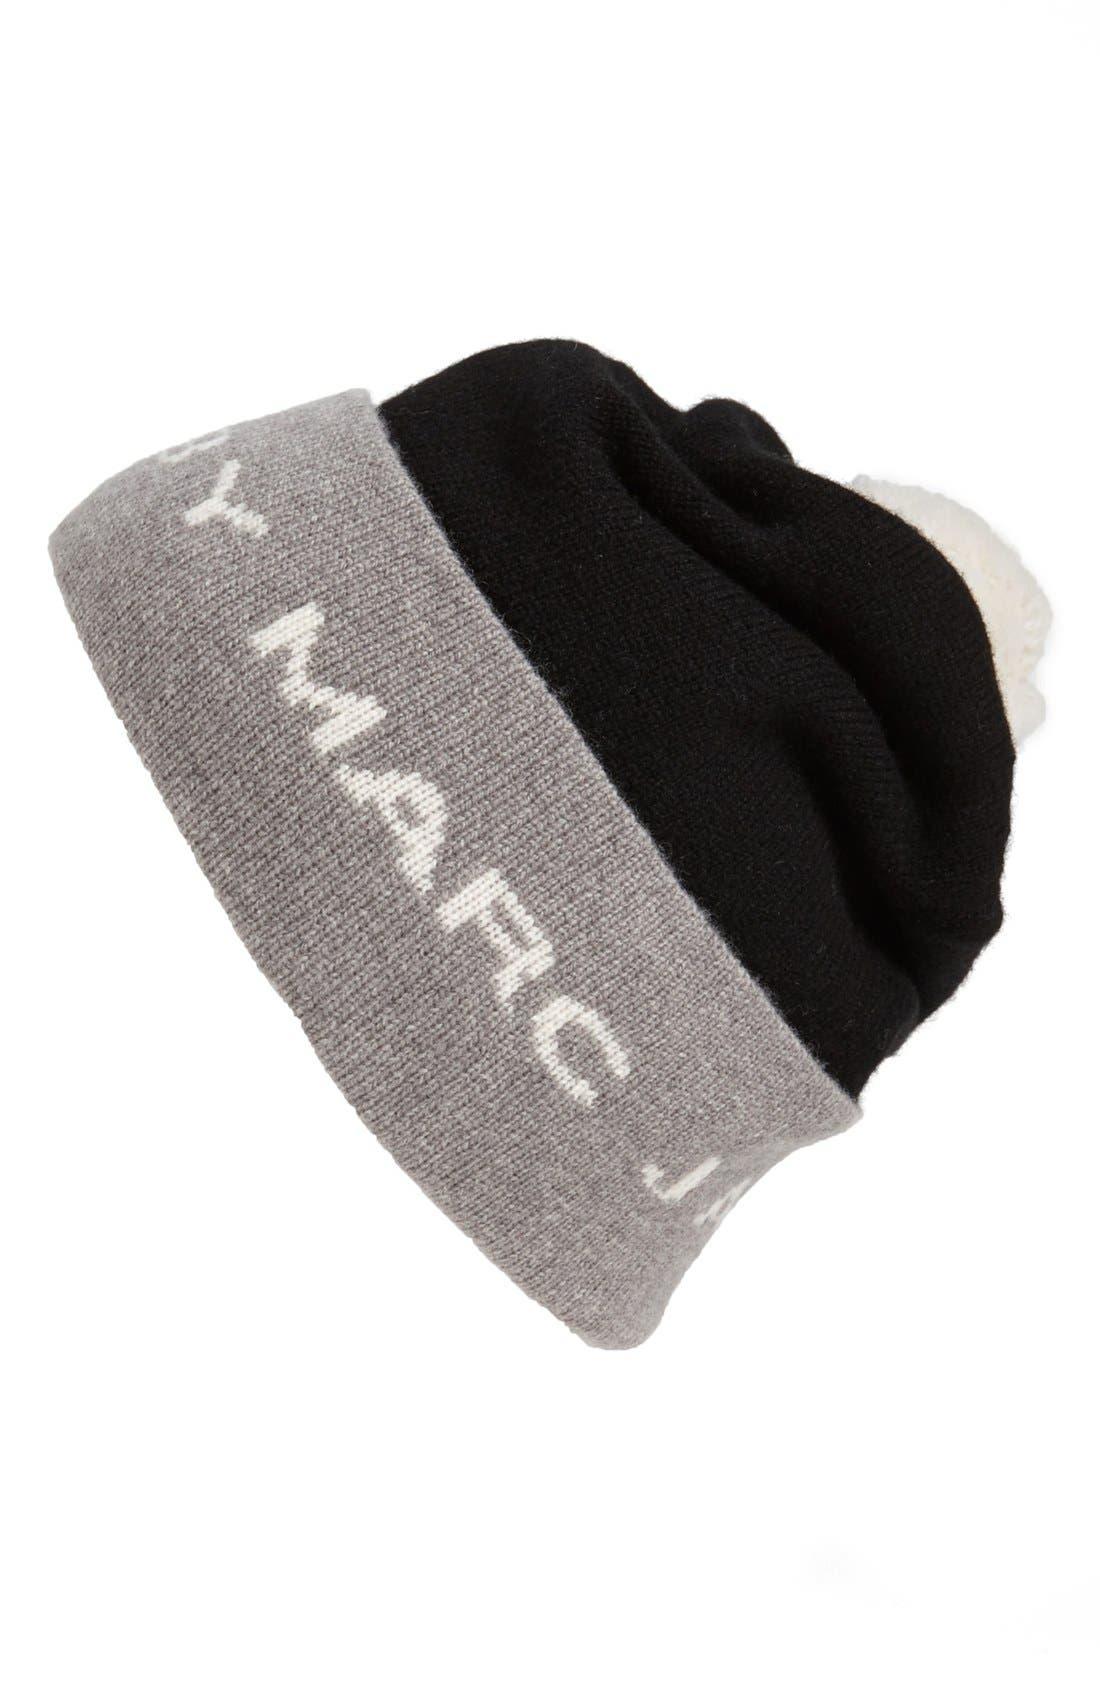 Alternate Image 1 Selected - MARC BY MARC JACOBS Logo Ski Hat